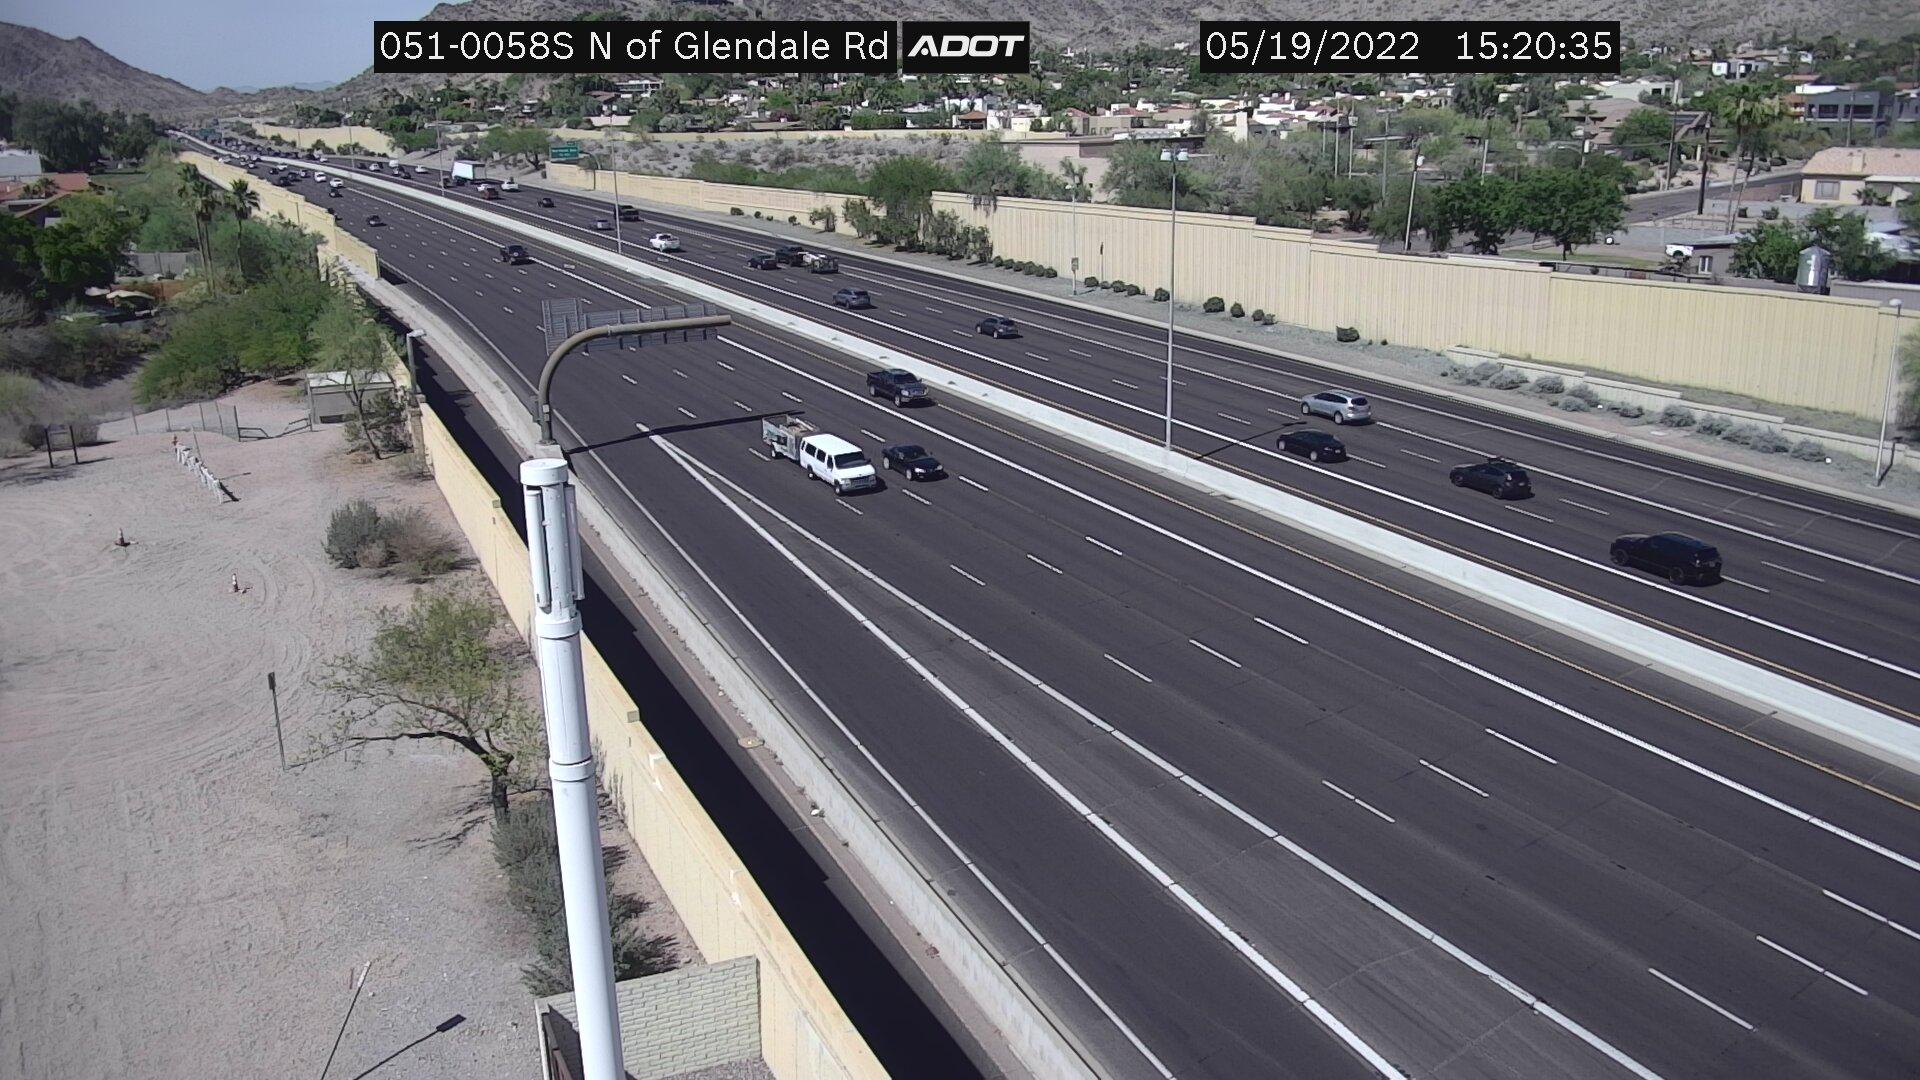 N of Glendale SB (SR51) (081) - Phoenix and Arizona